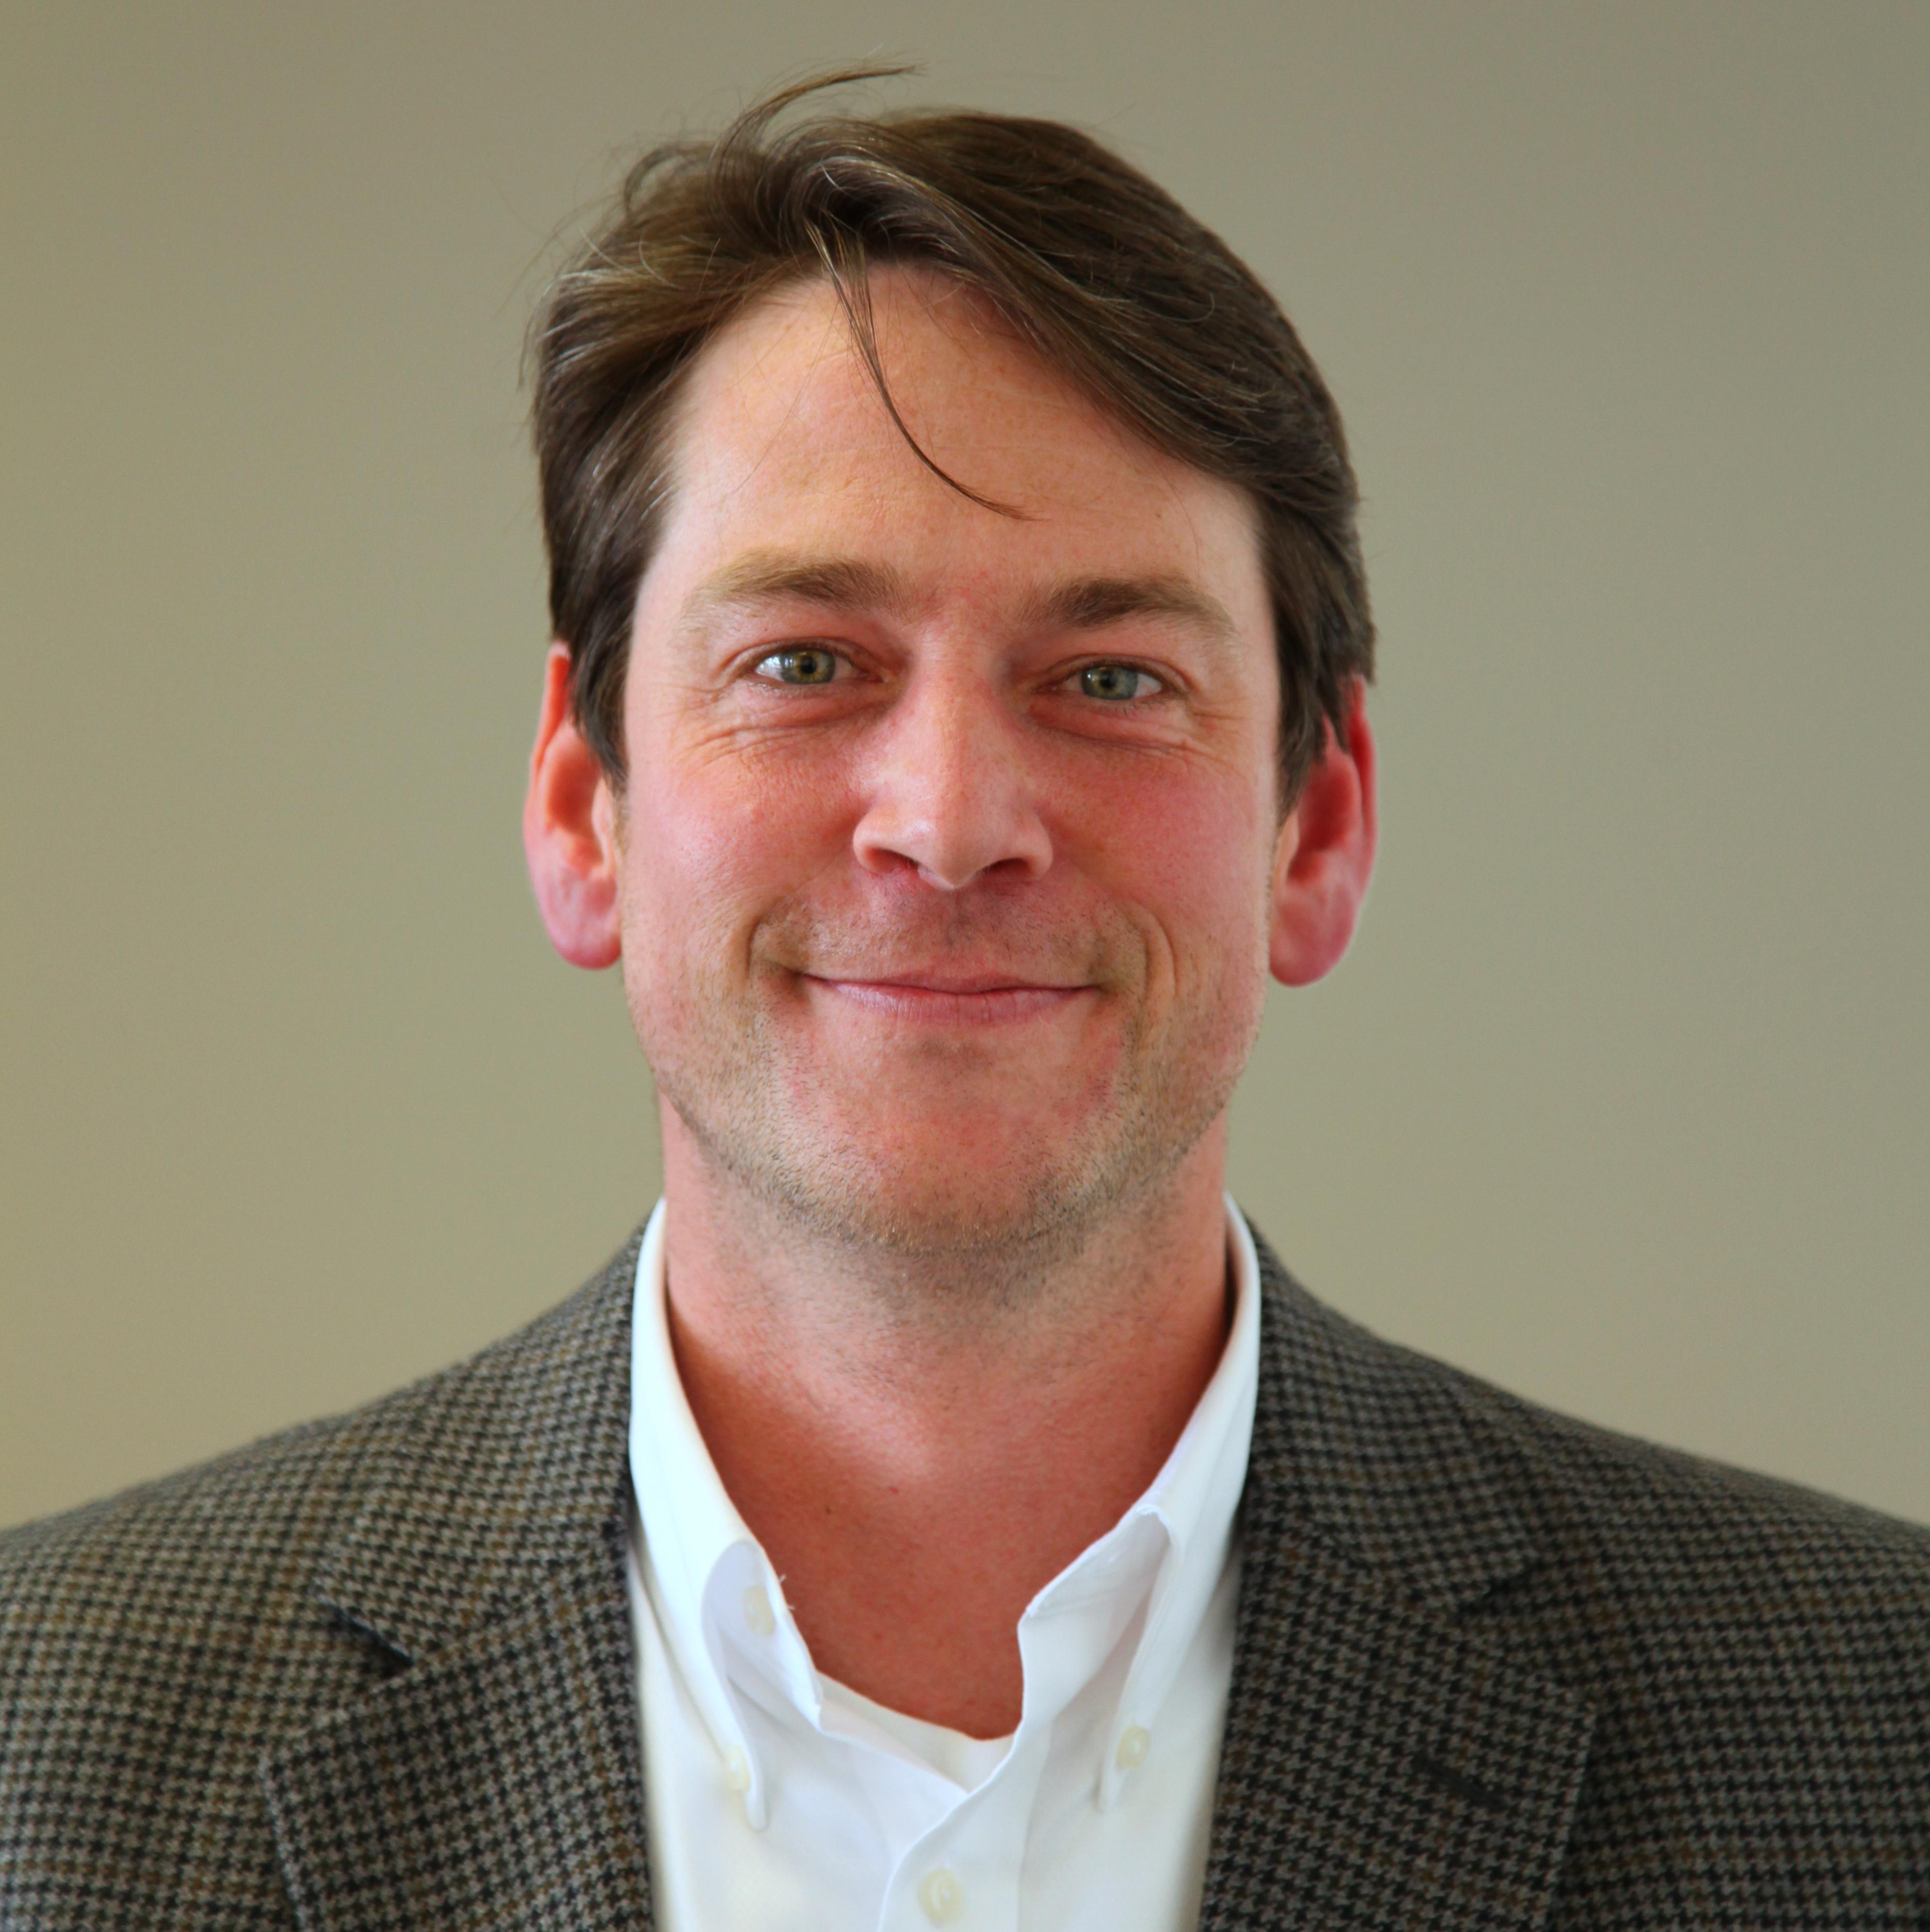 G. Brent Eickhoff